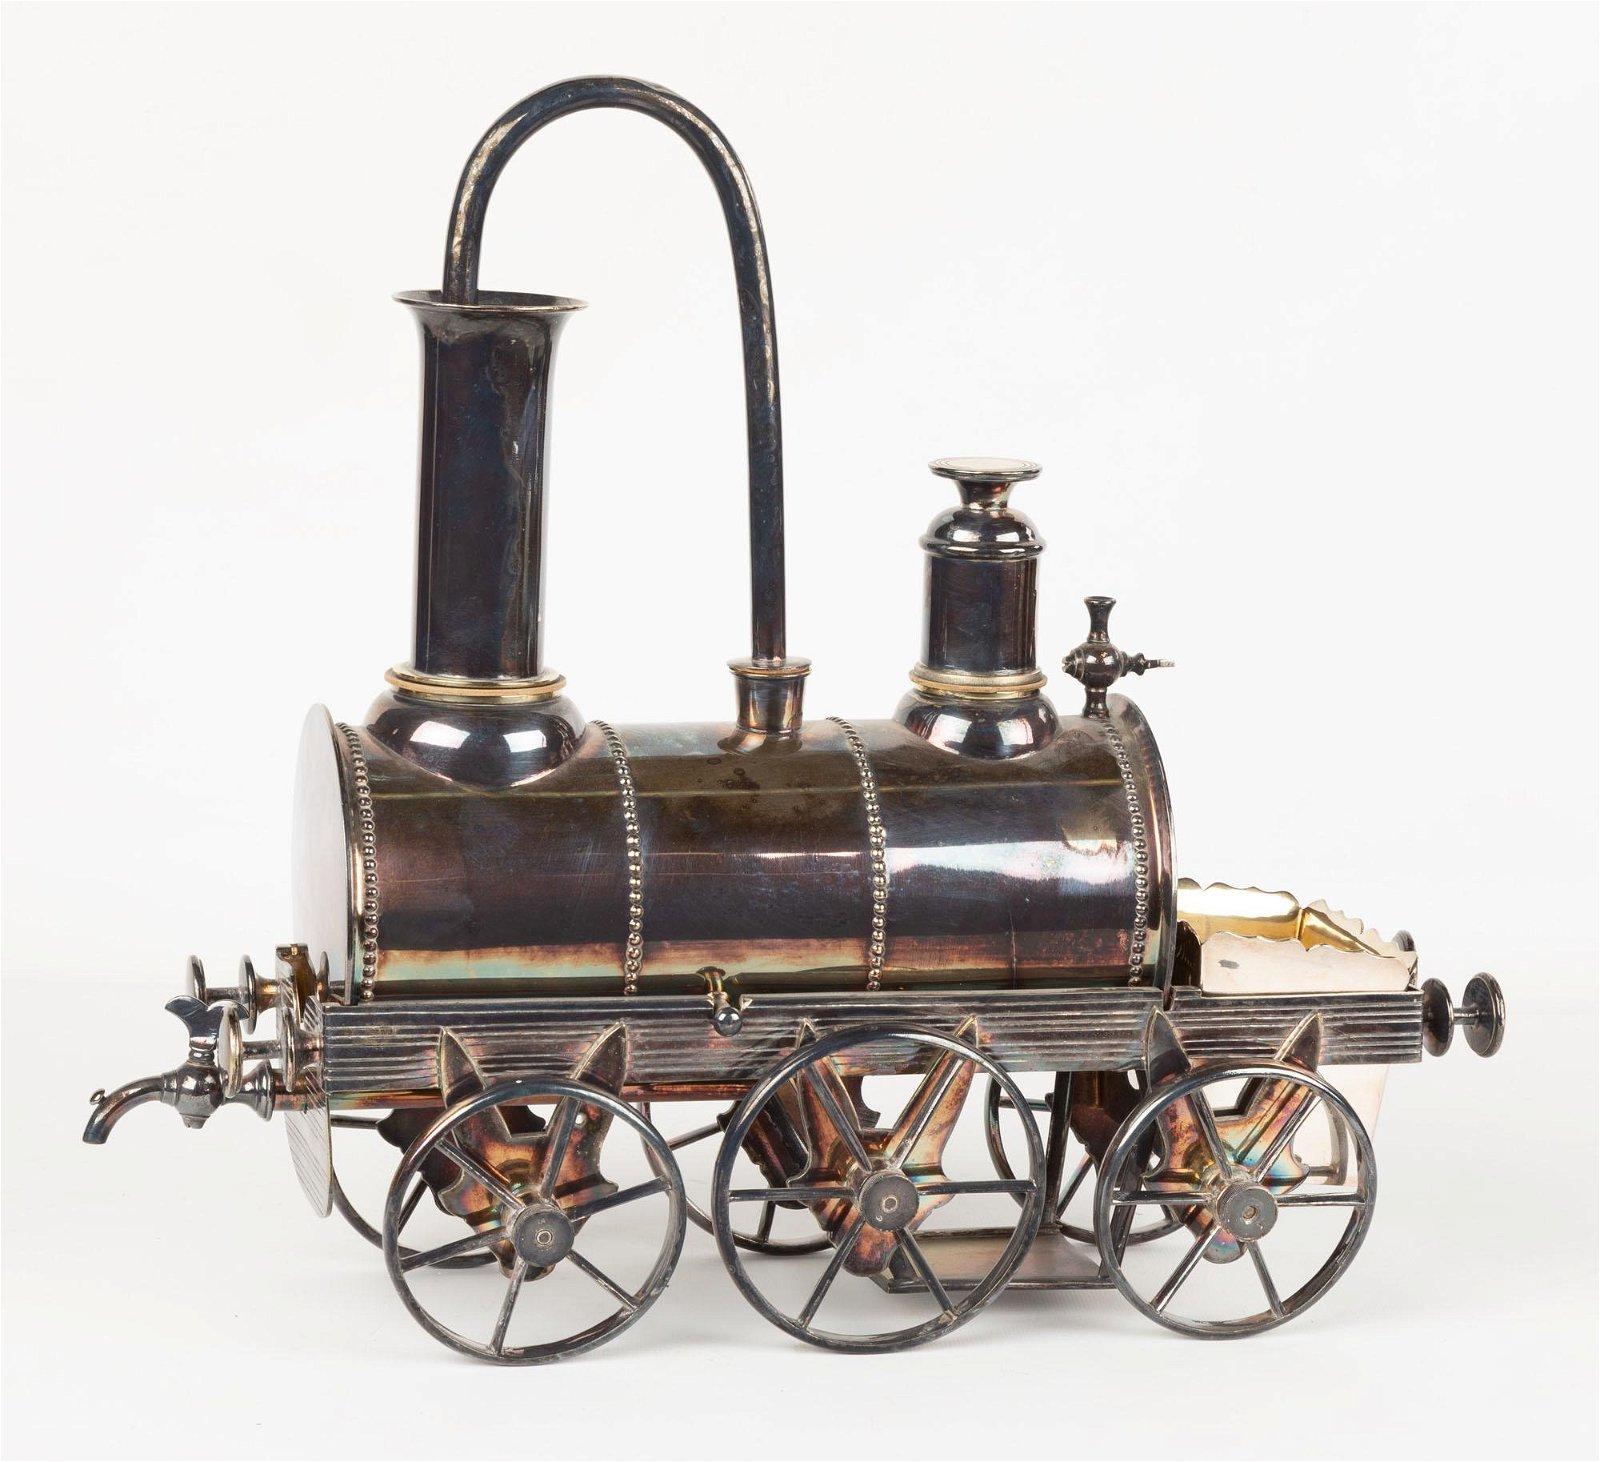 Unusual Silver Plate Tea Urn in Form of Locomotive